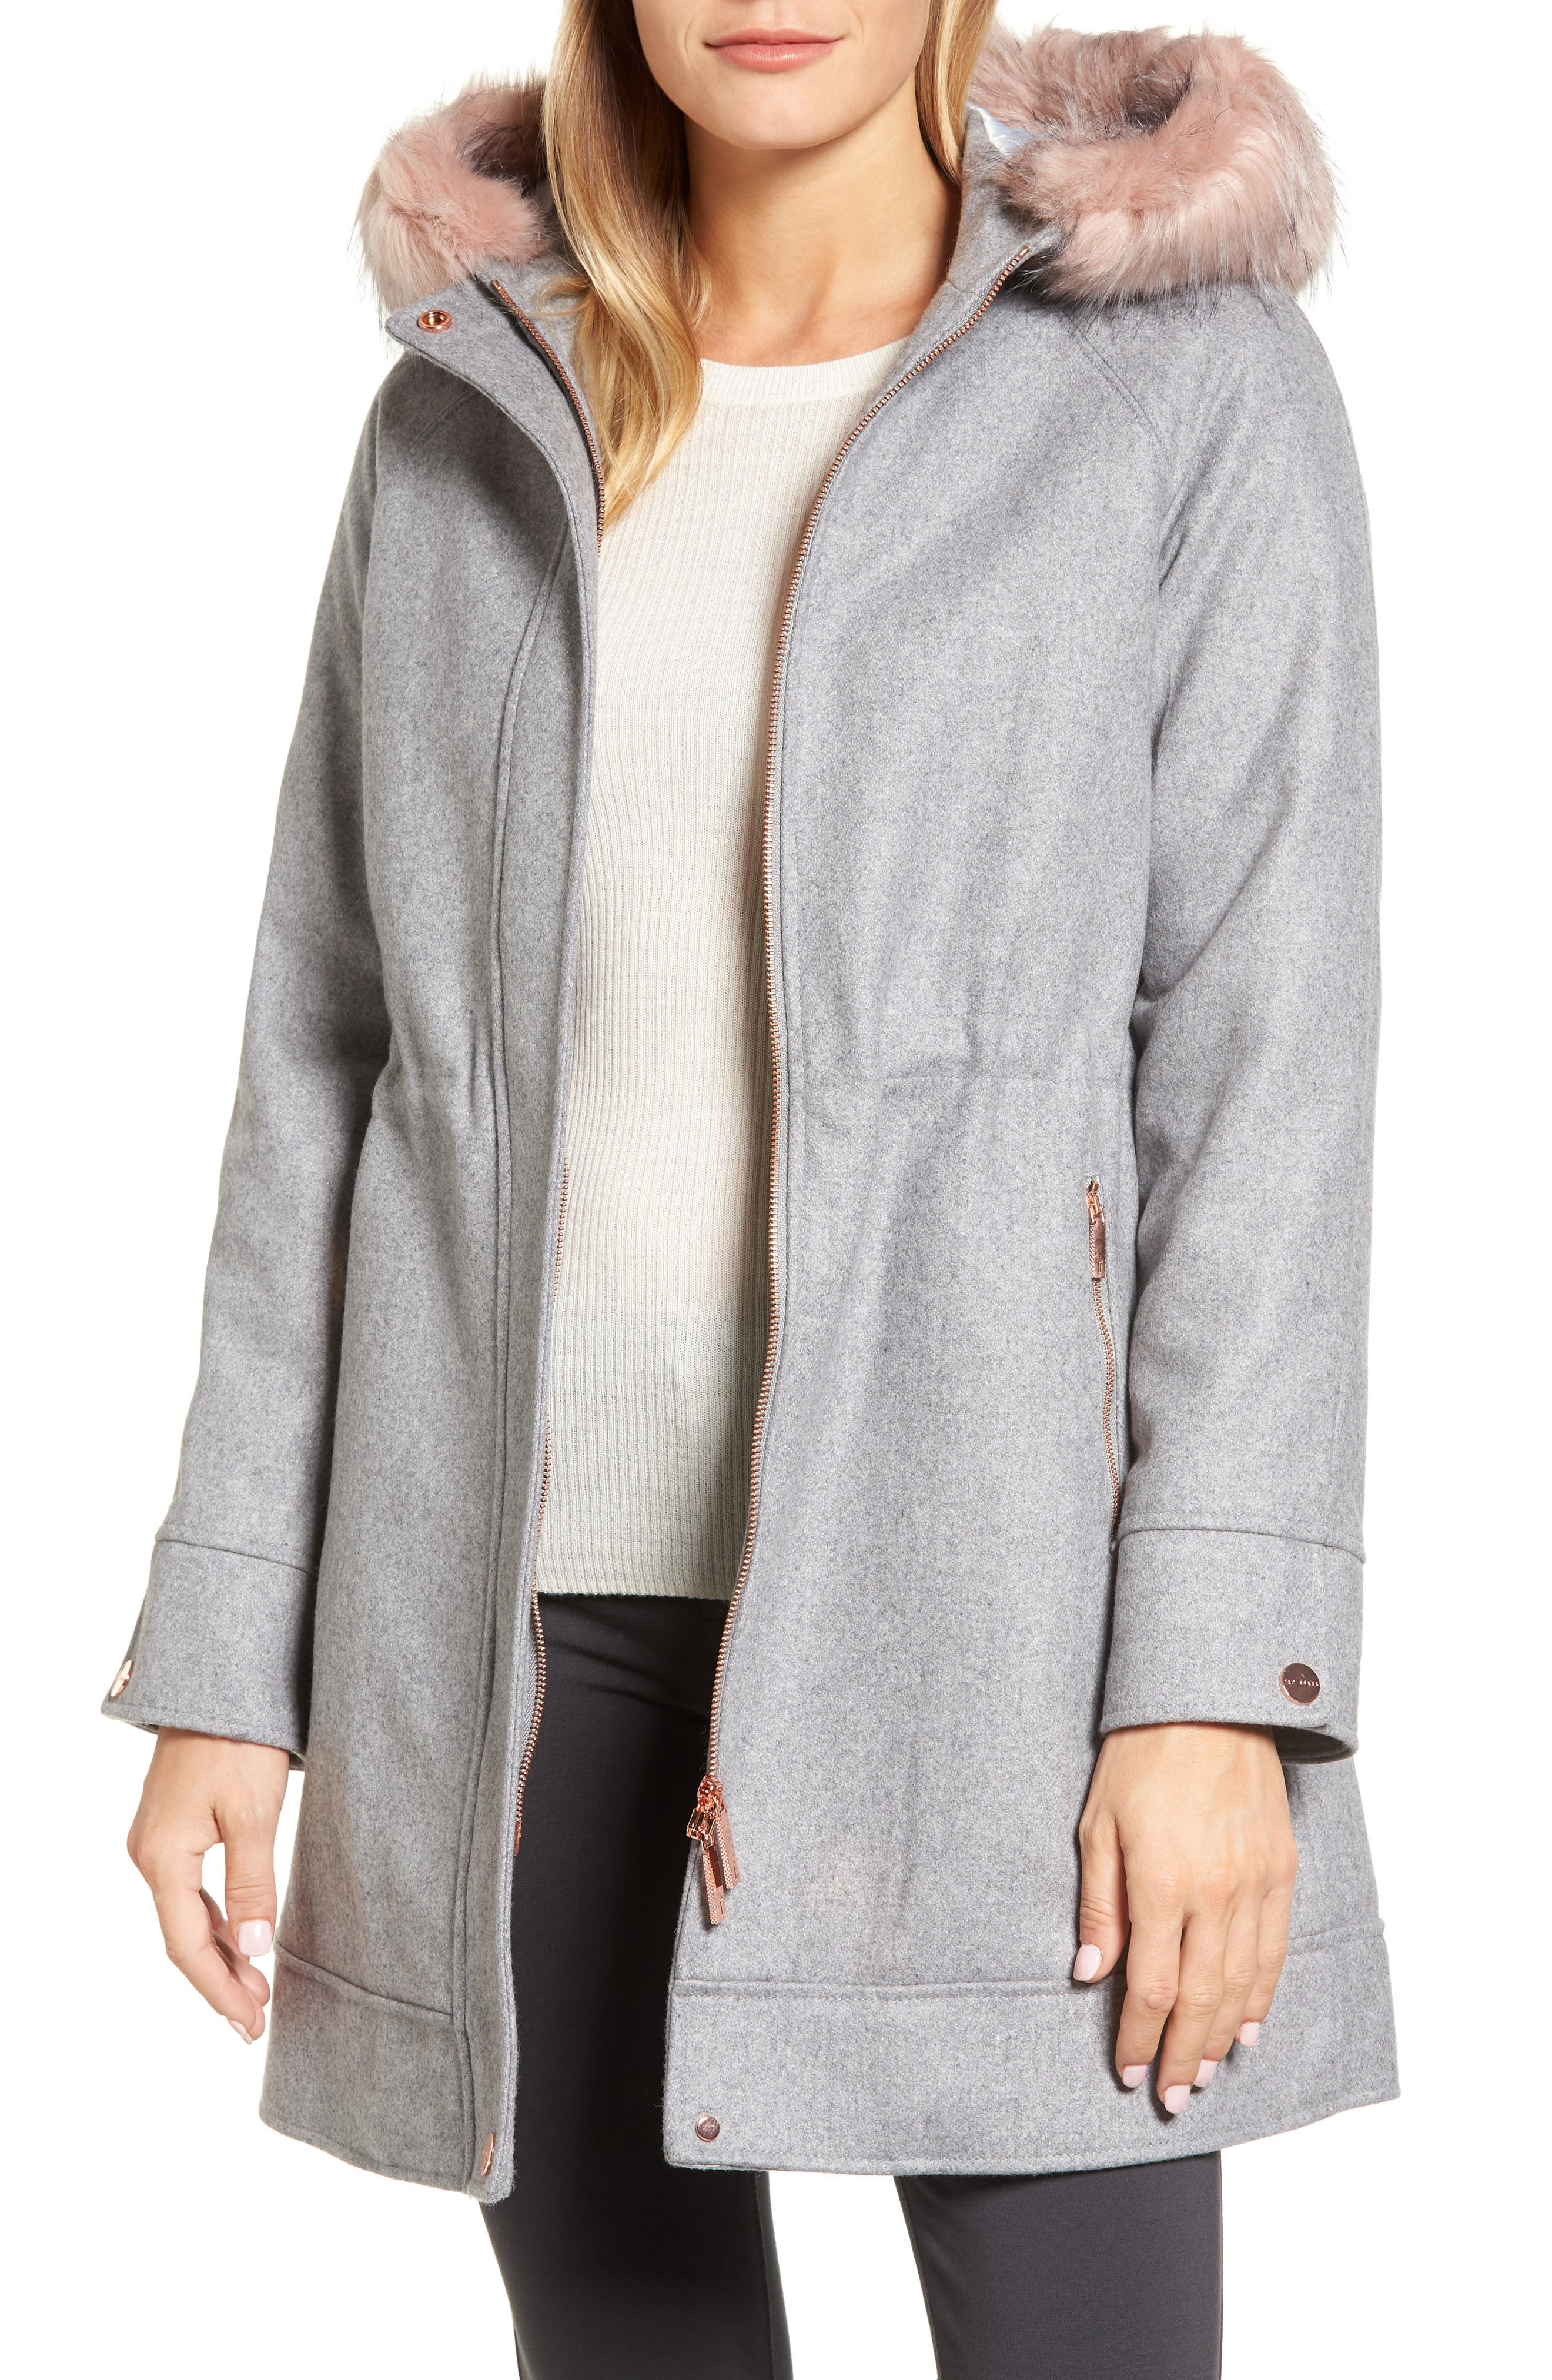 Wool Coat with Faux Fur Trim,                         Main,                         color, Light Grey